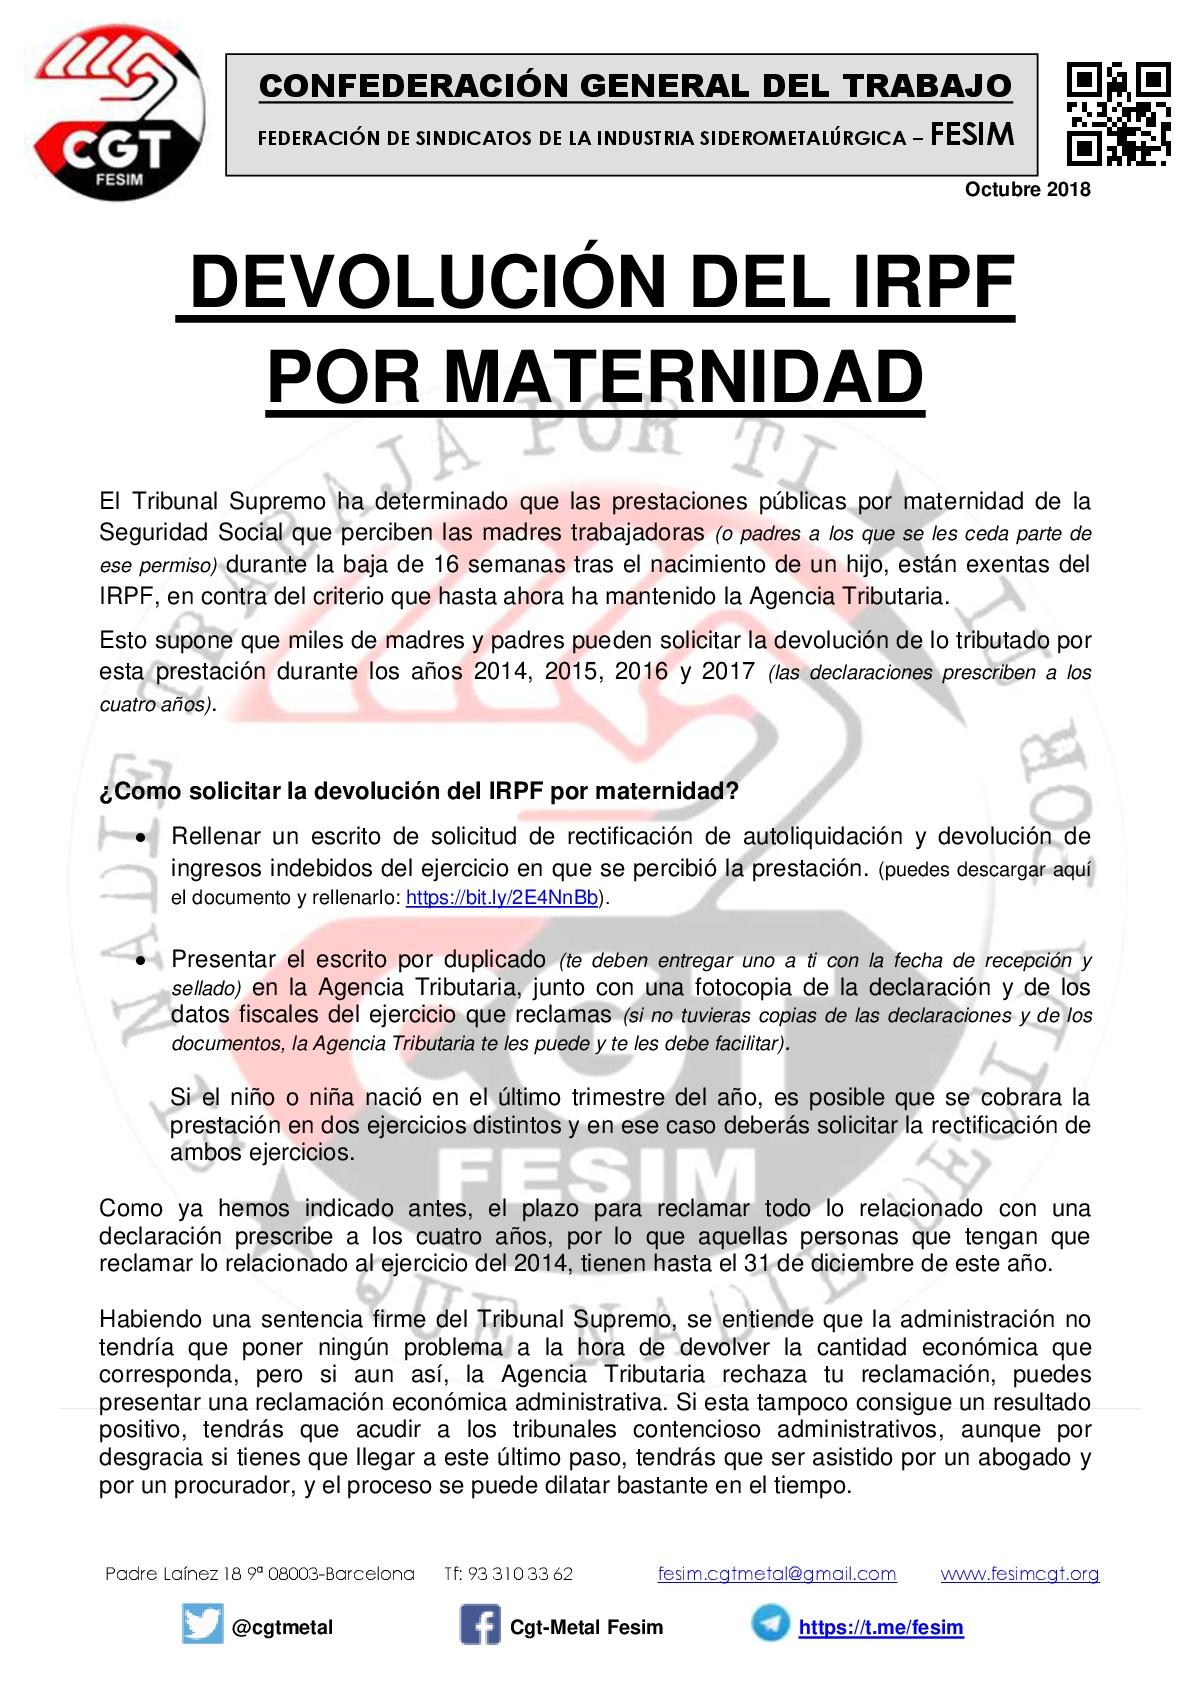 IRPF Maternidad-001(2)